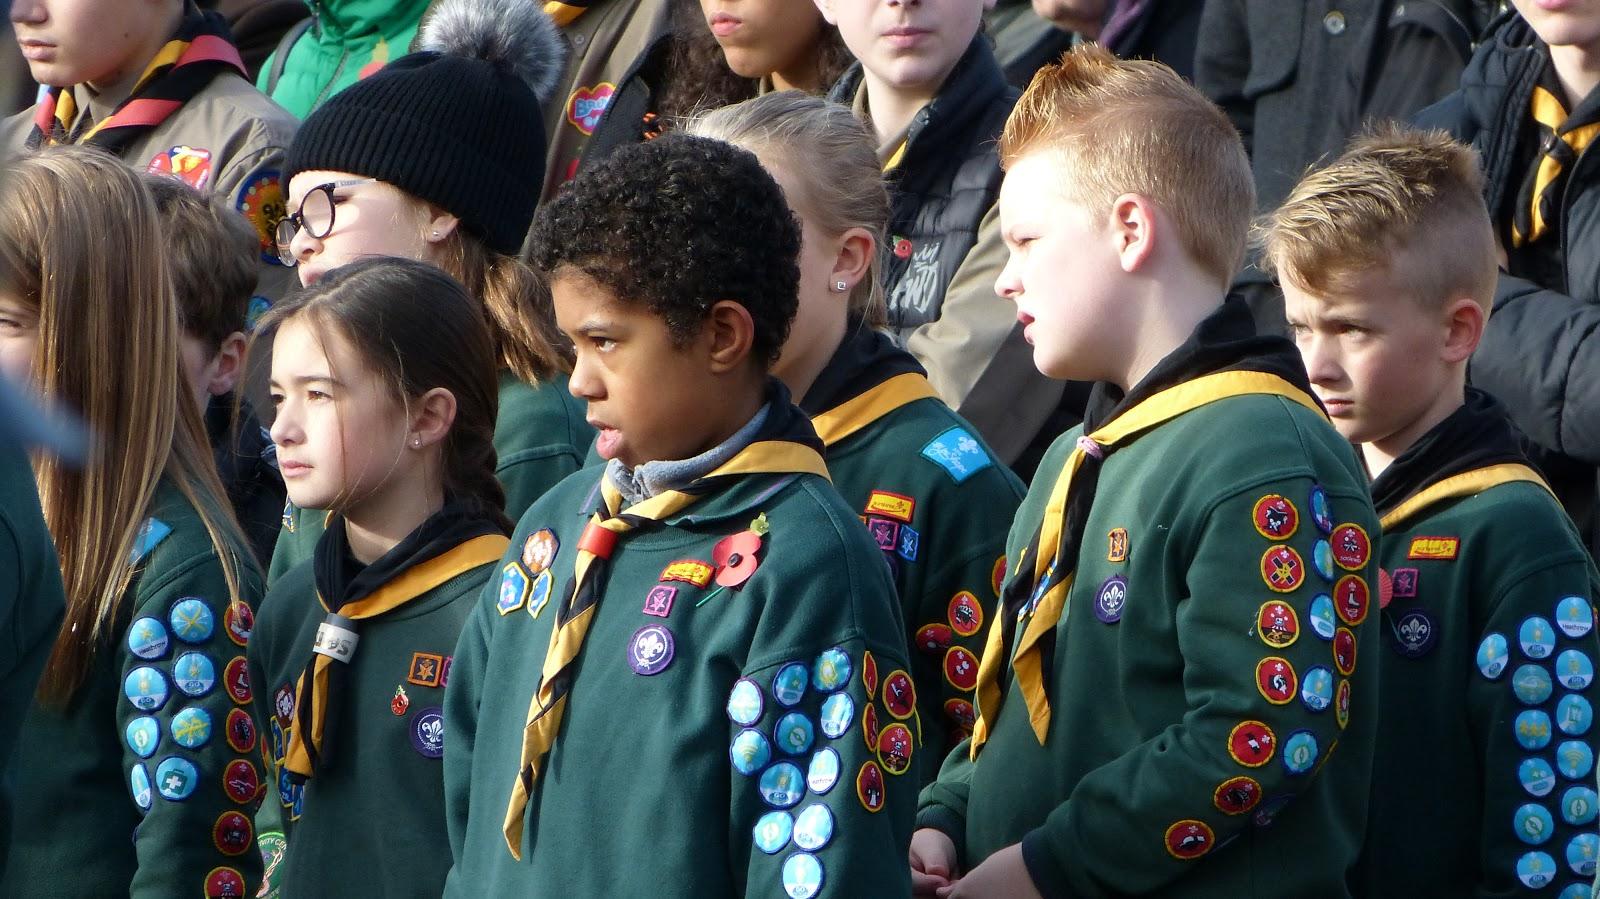 Cub scouts Remembrance parade 2019 in Castle Bromwich